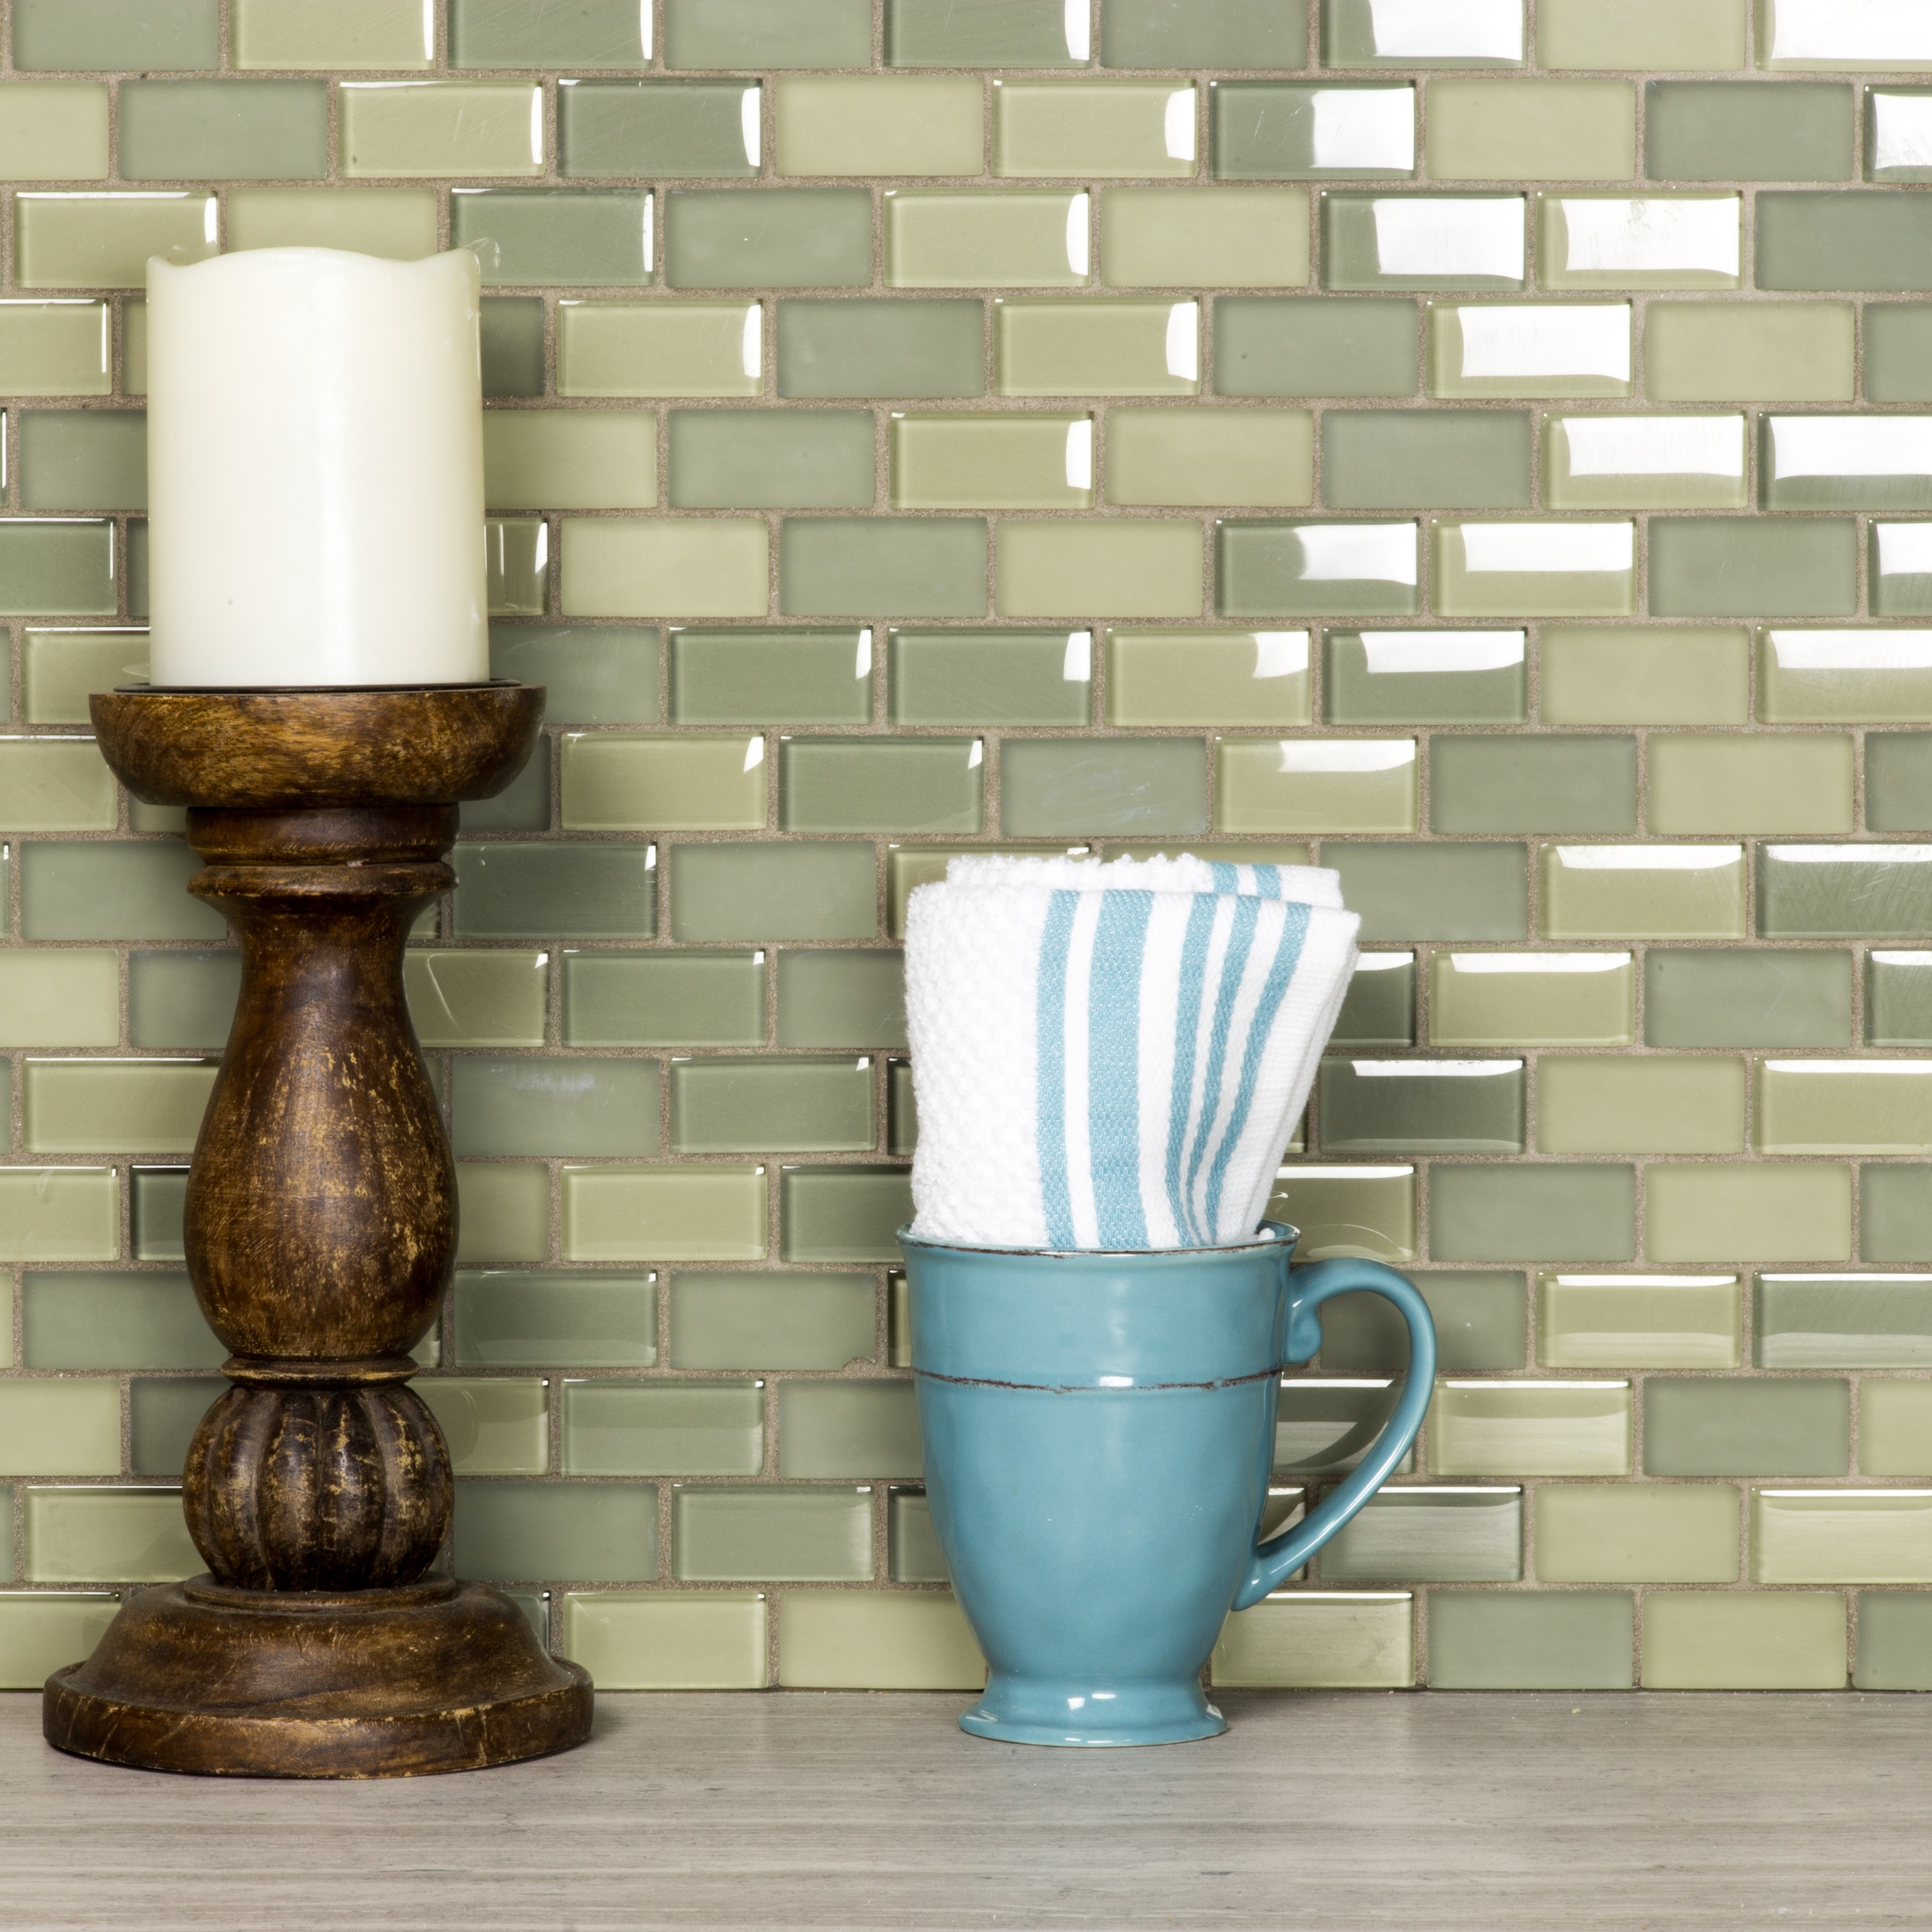 Free Flow 1 in x 2 in Glass Brick Mosaic in FOG Blend